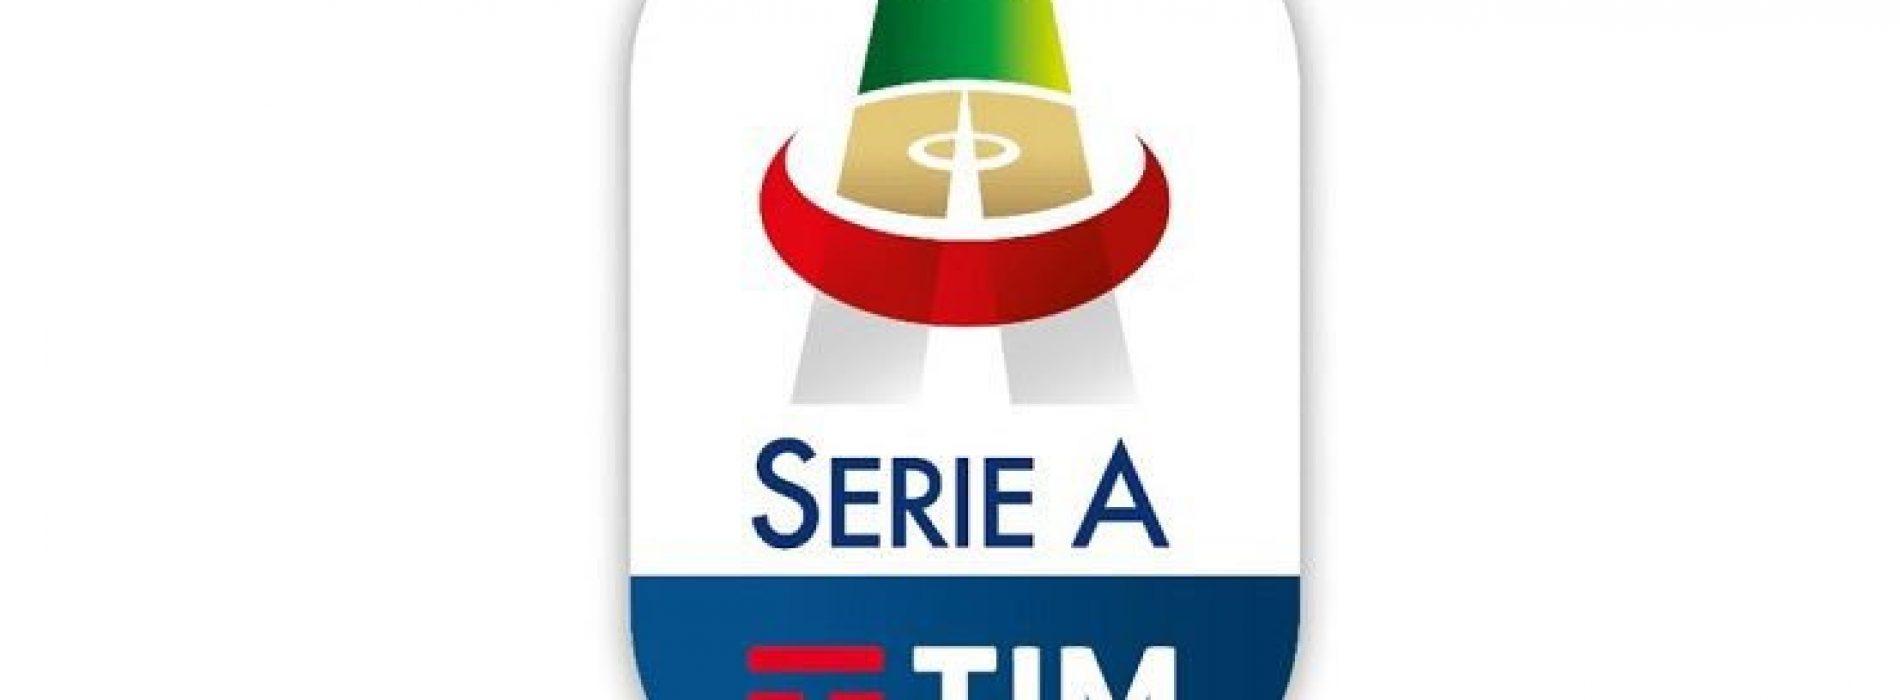 Serie A, la griglia di partenza: Juve sempre davanti a tutti, incognita Milan